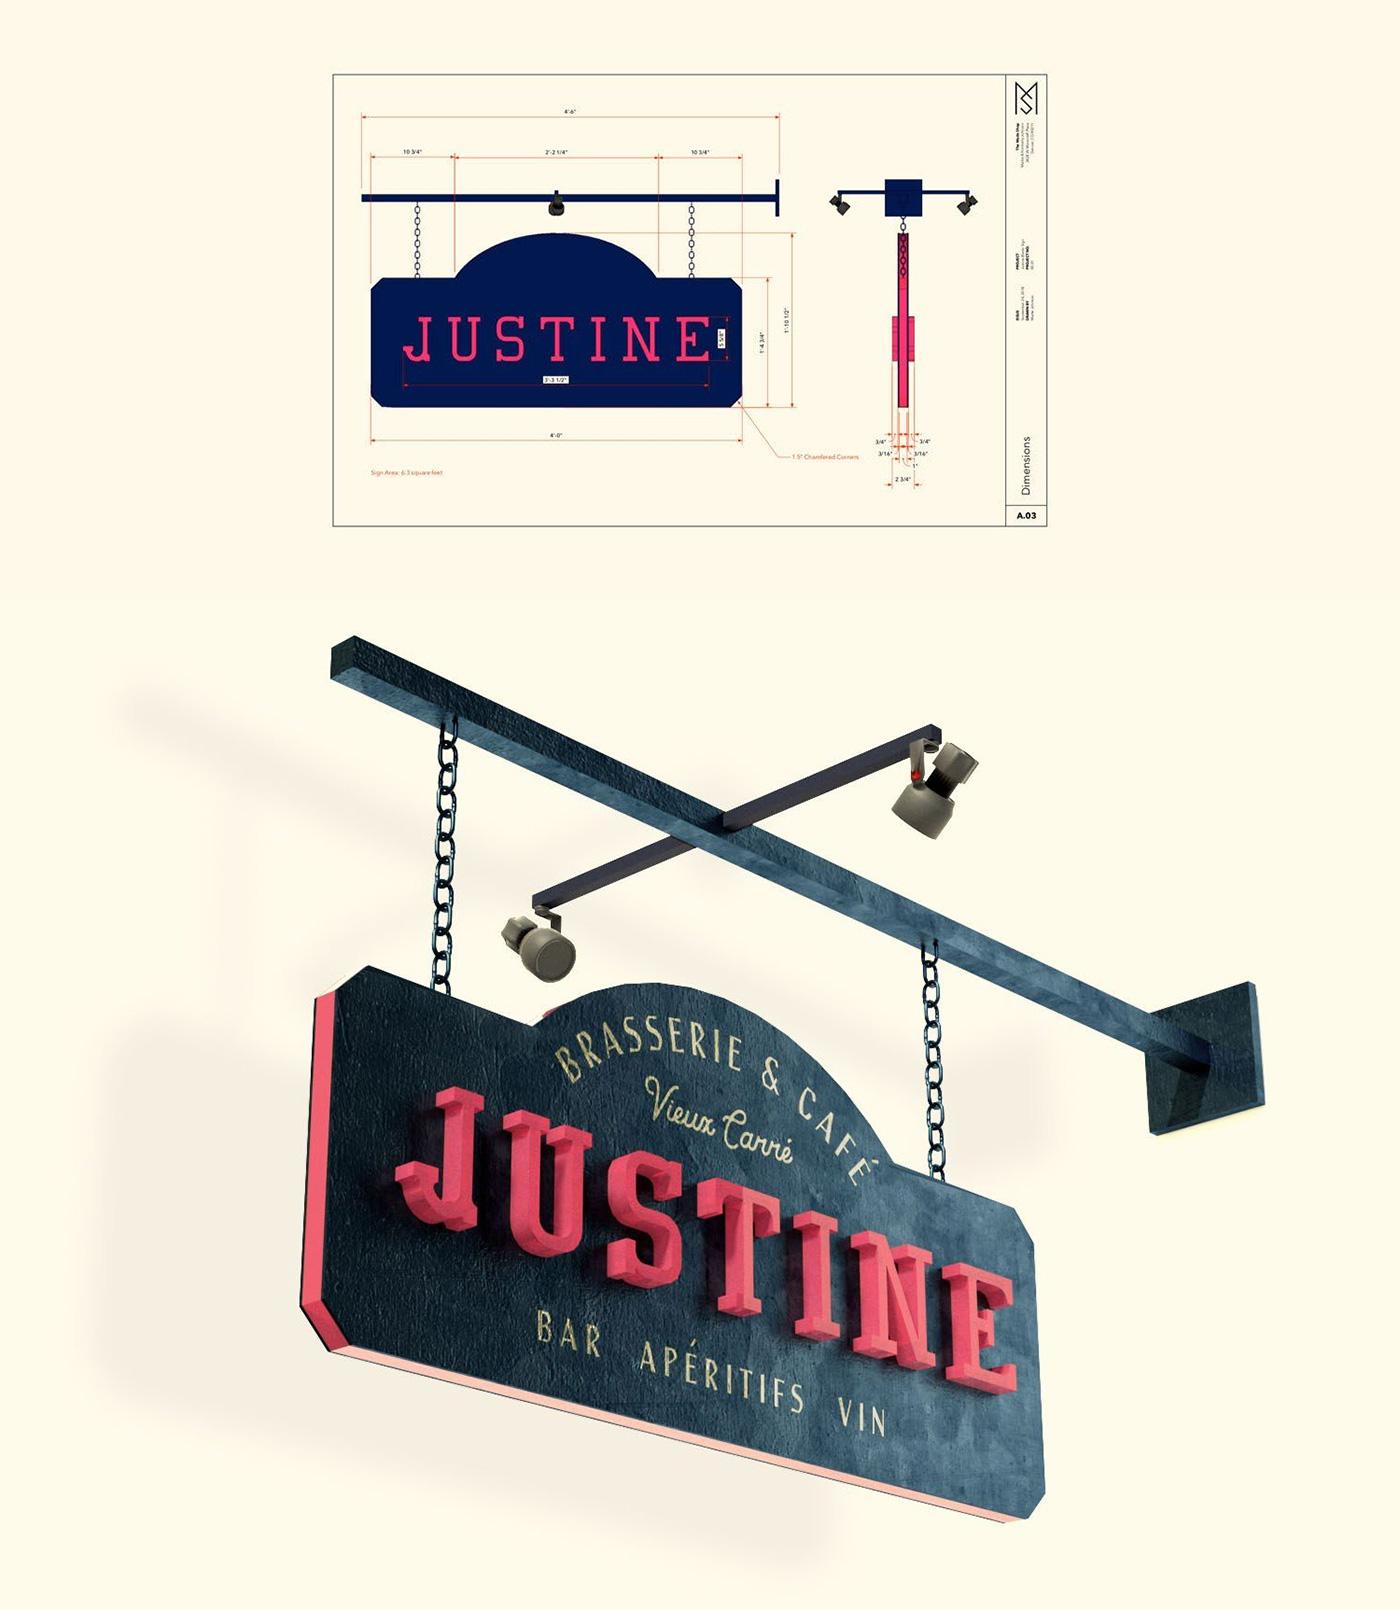 Justine identity